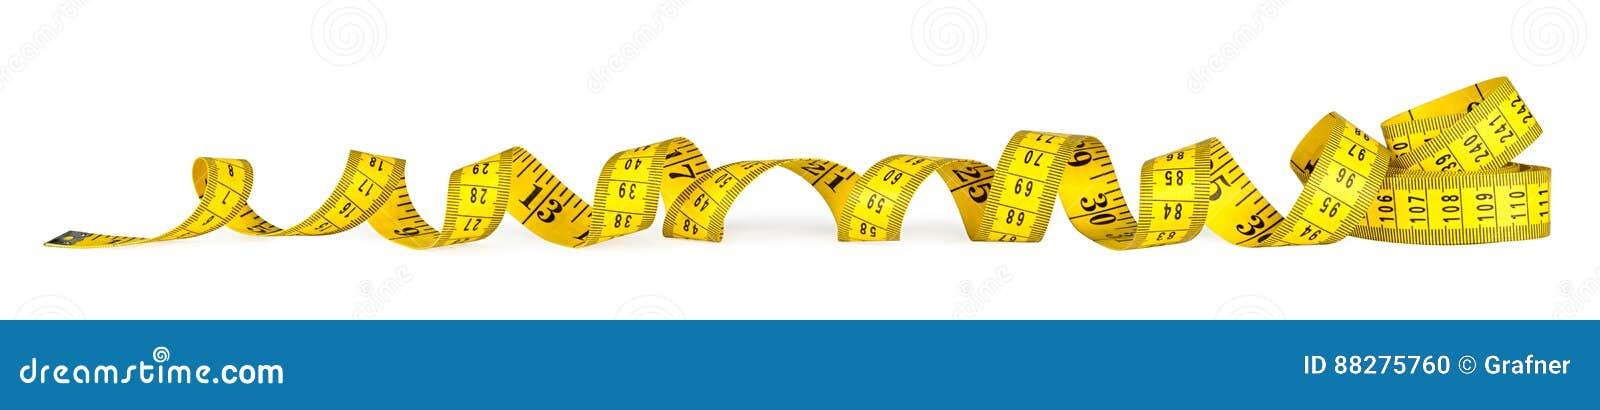 Cinta métrica métrica amarilla